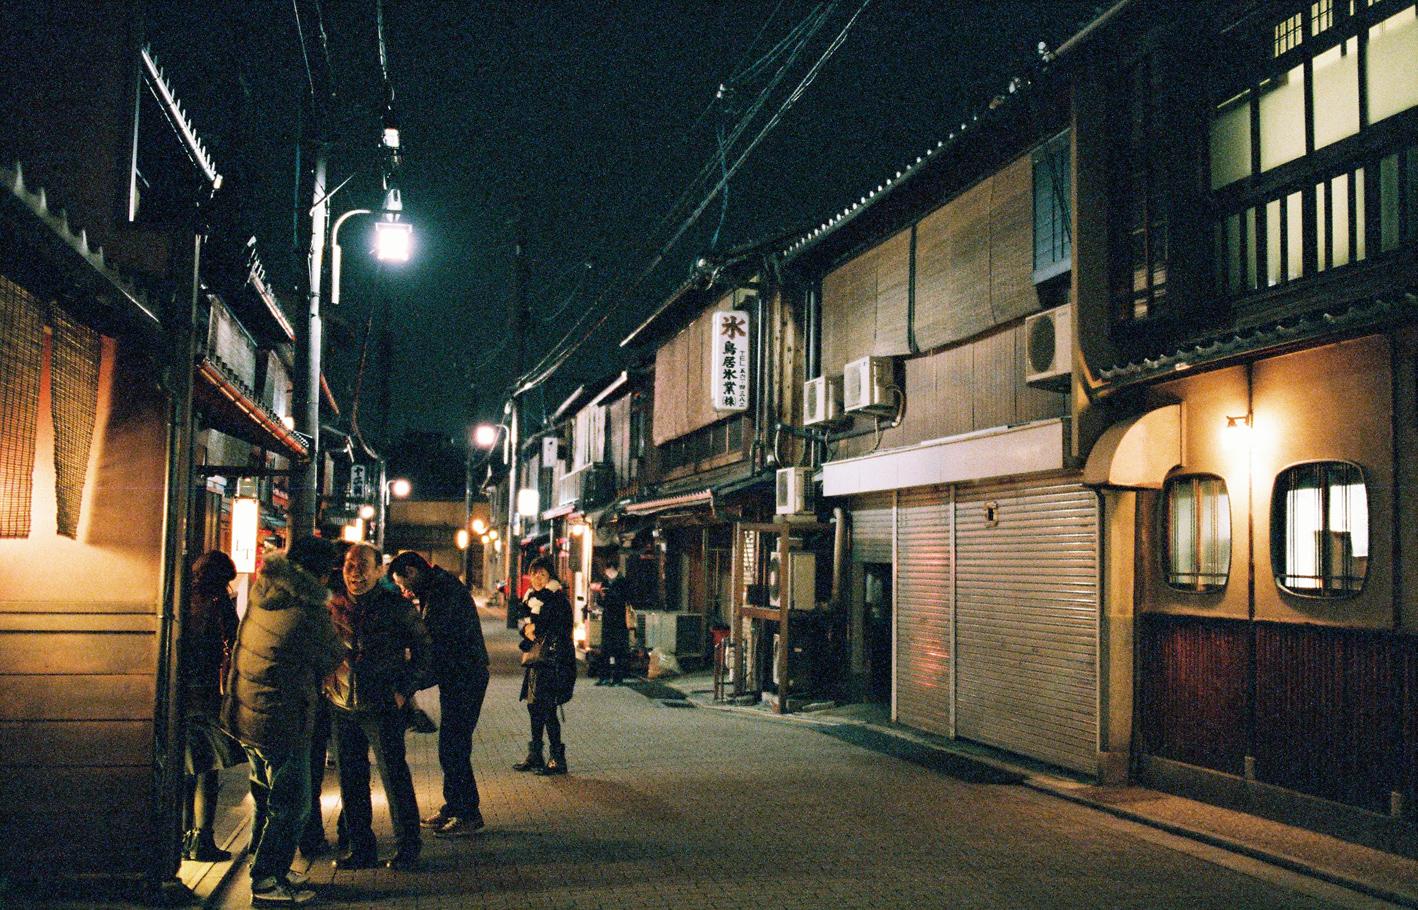 027-kyoto-arashiyama-sophie-baker-photography